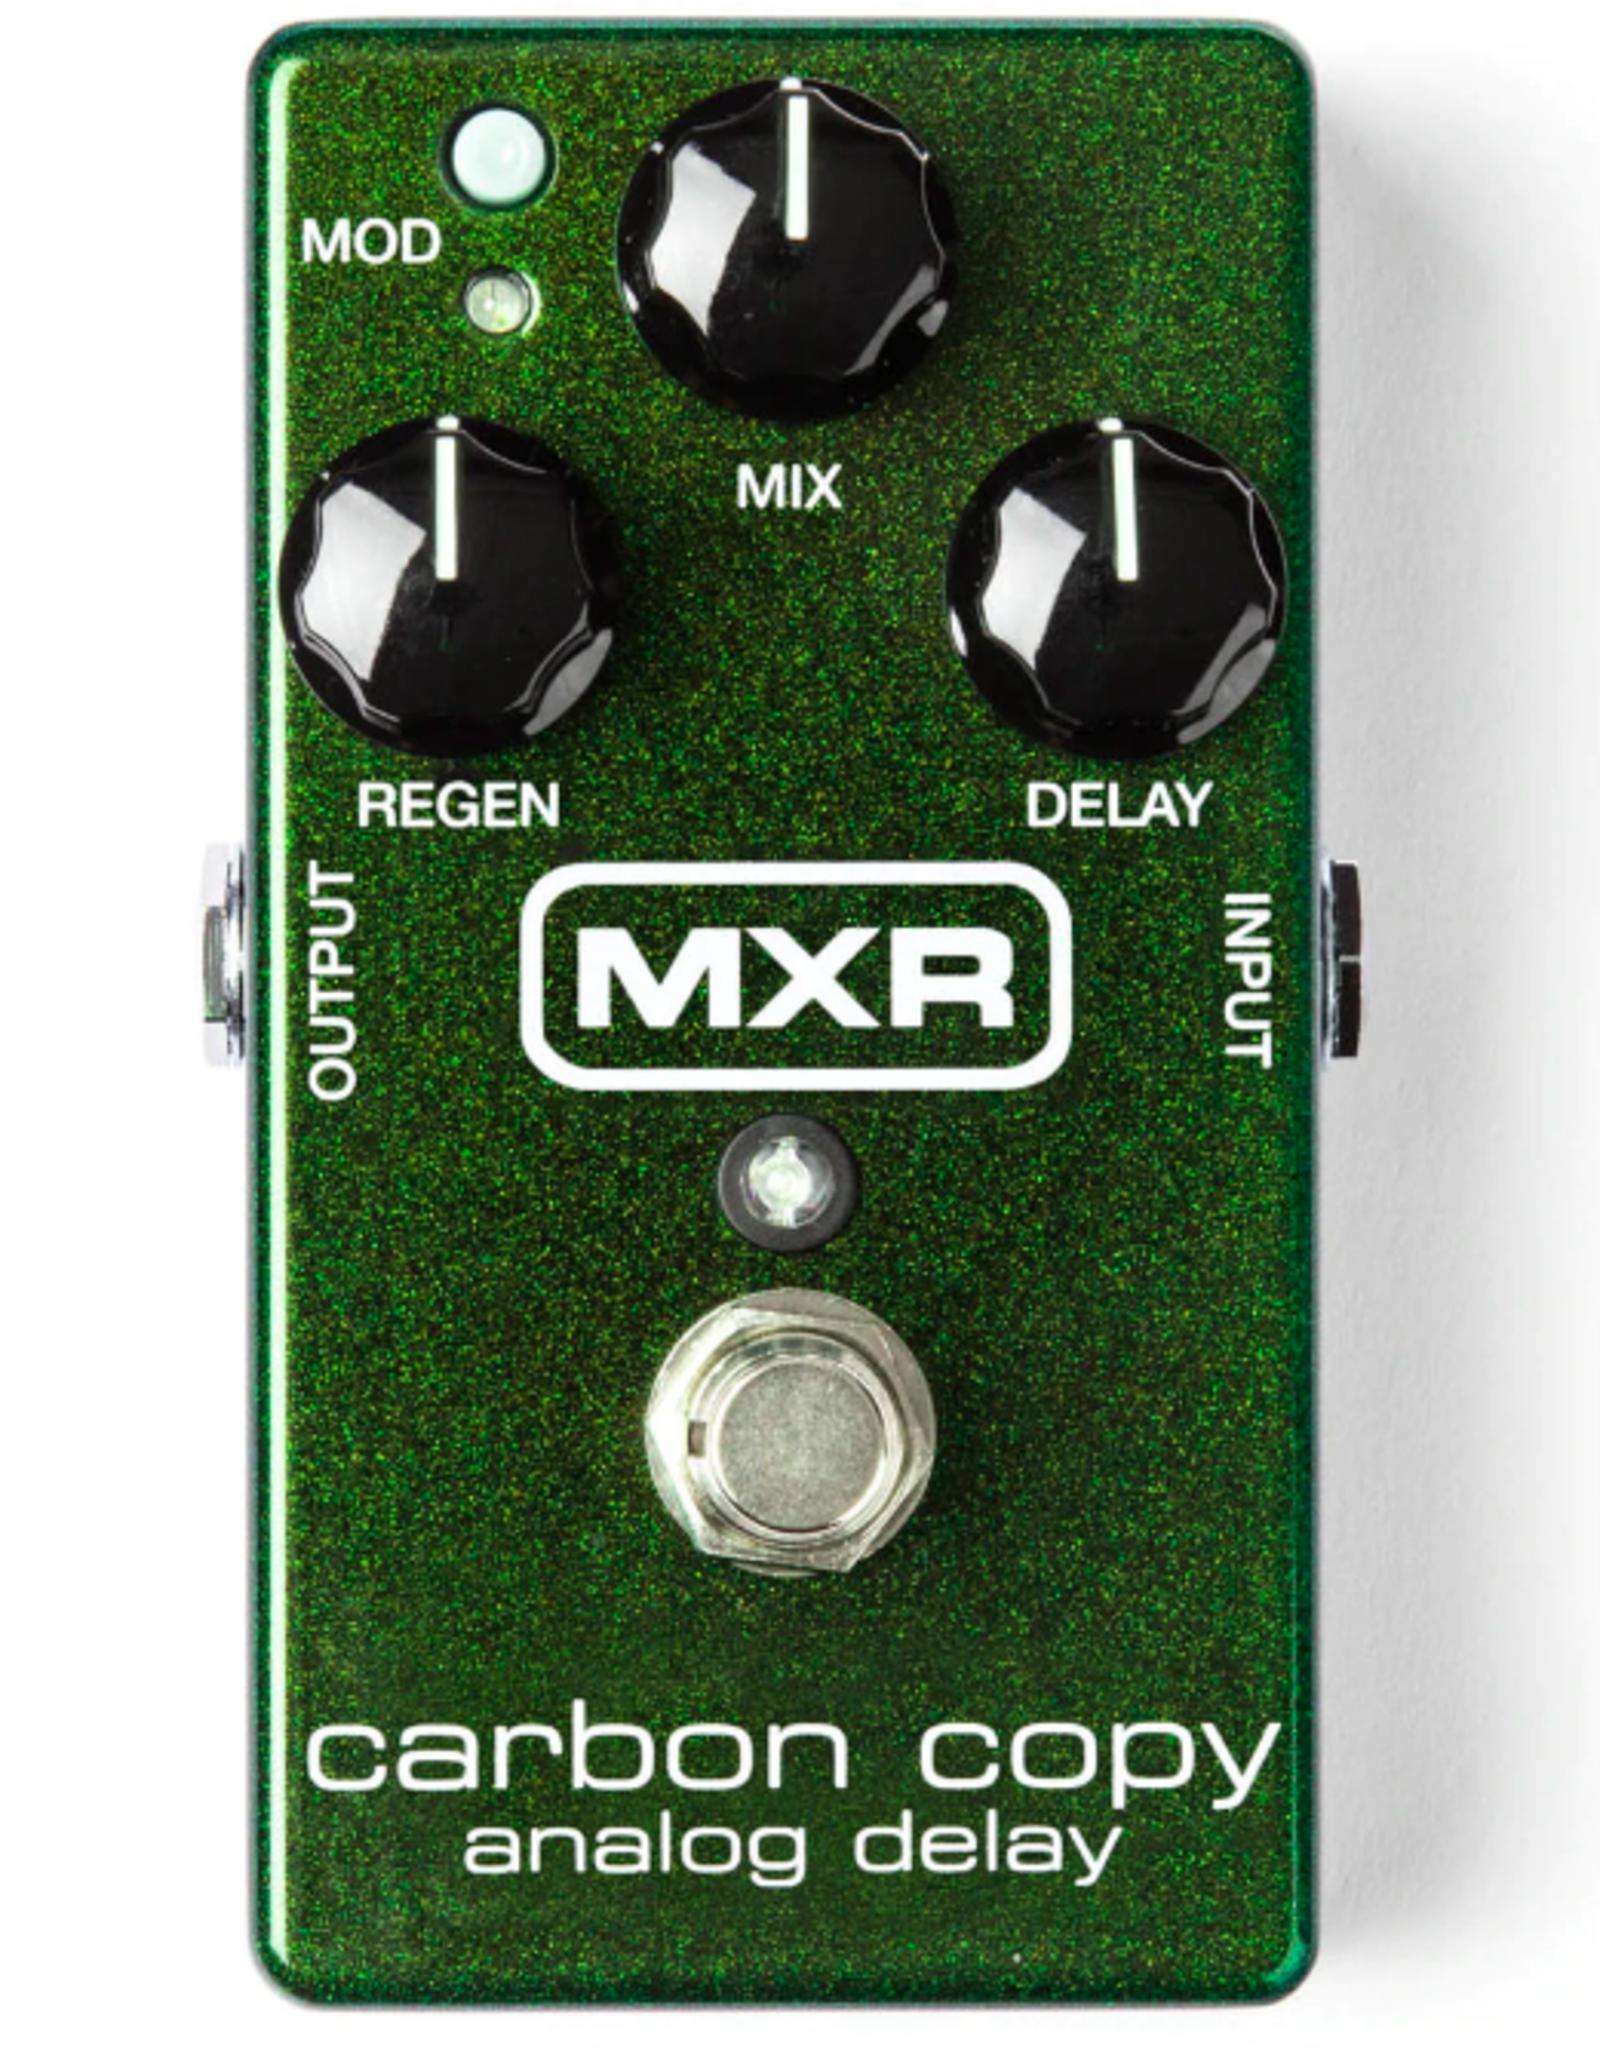 MXR MXR CARBON COPY